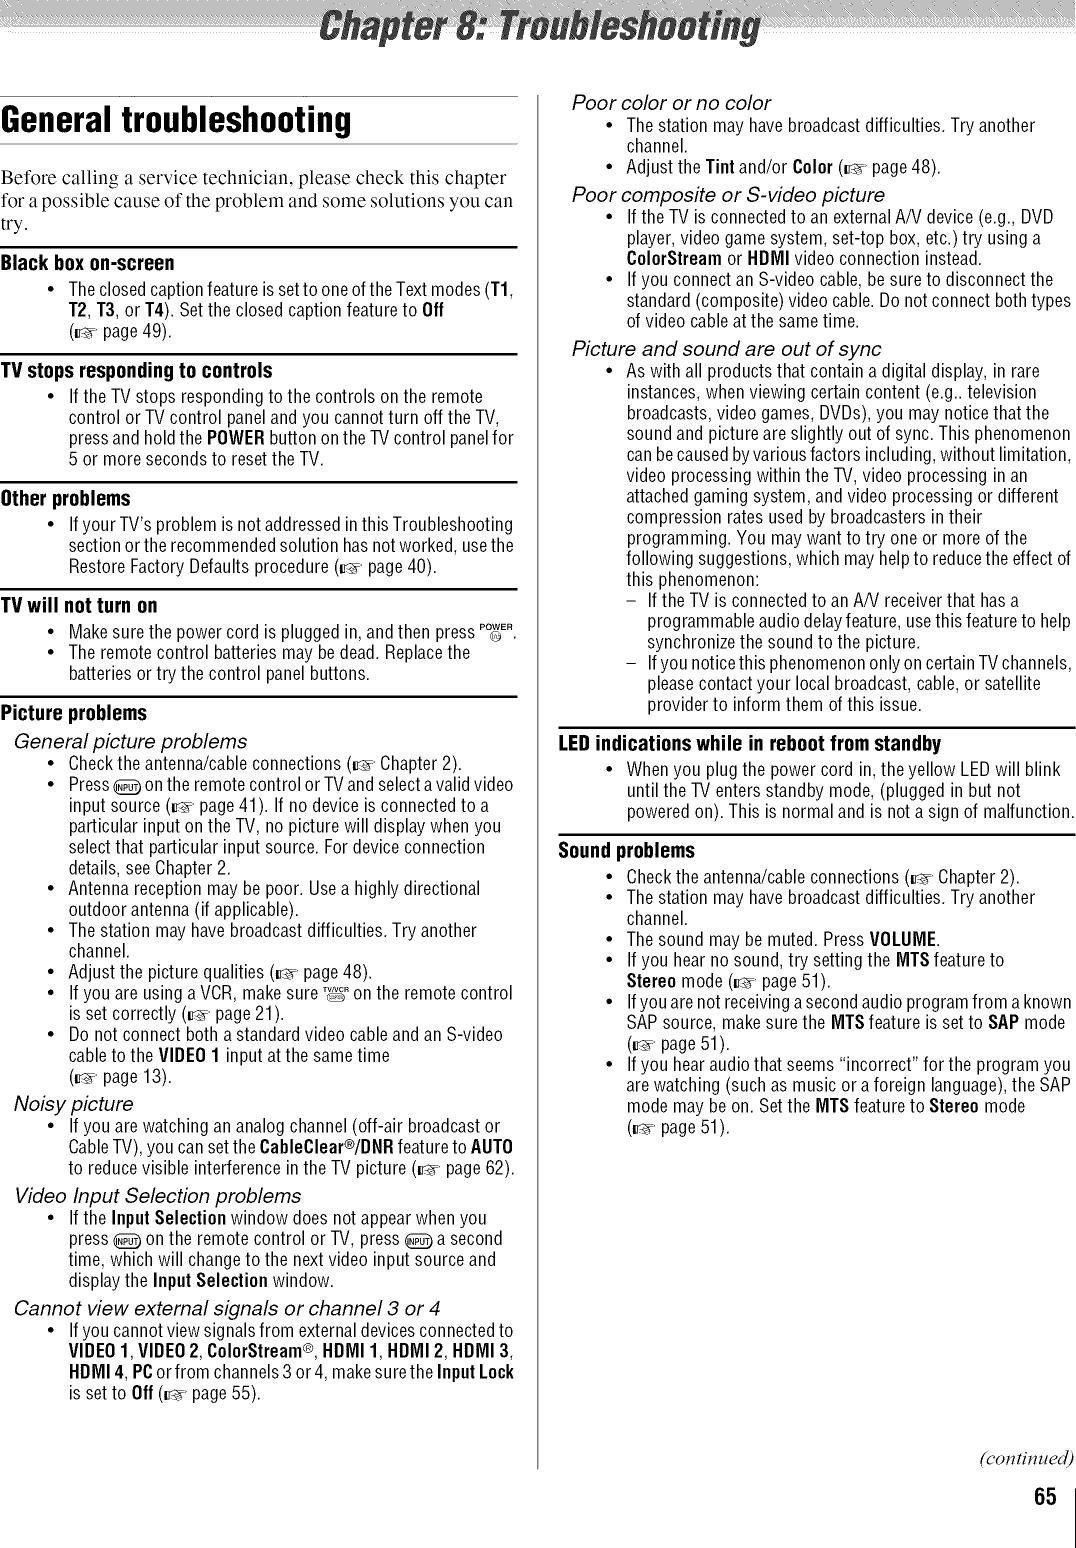 Toshiba 42XV540U User Manual LCD TELEVISON Manuals And